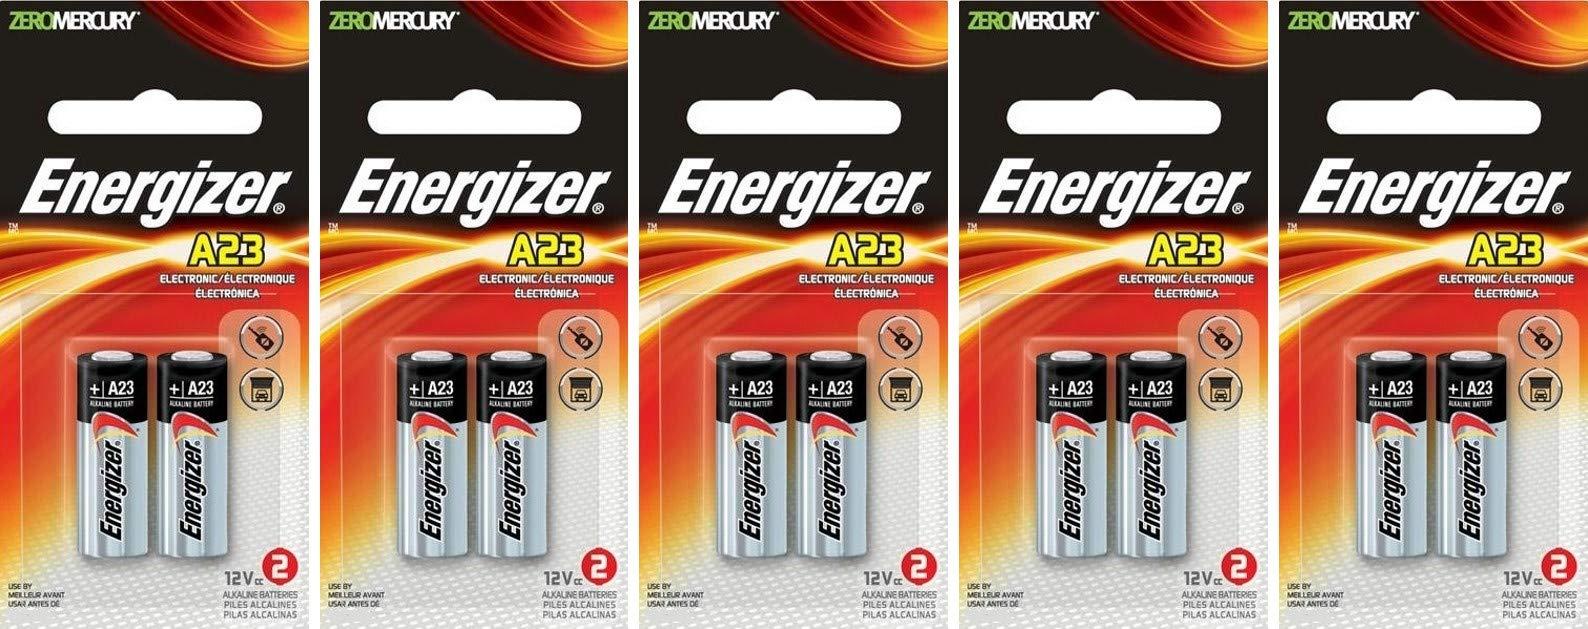 5 X 2 Energizer A23 21/23 23A MN21 GP23 12v Alkaline Garage Door Opener 10 Batteries by My Battery Supplier